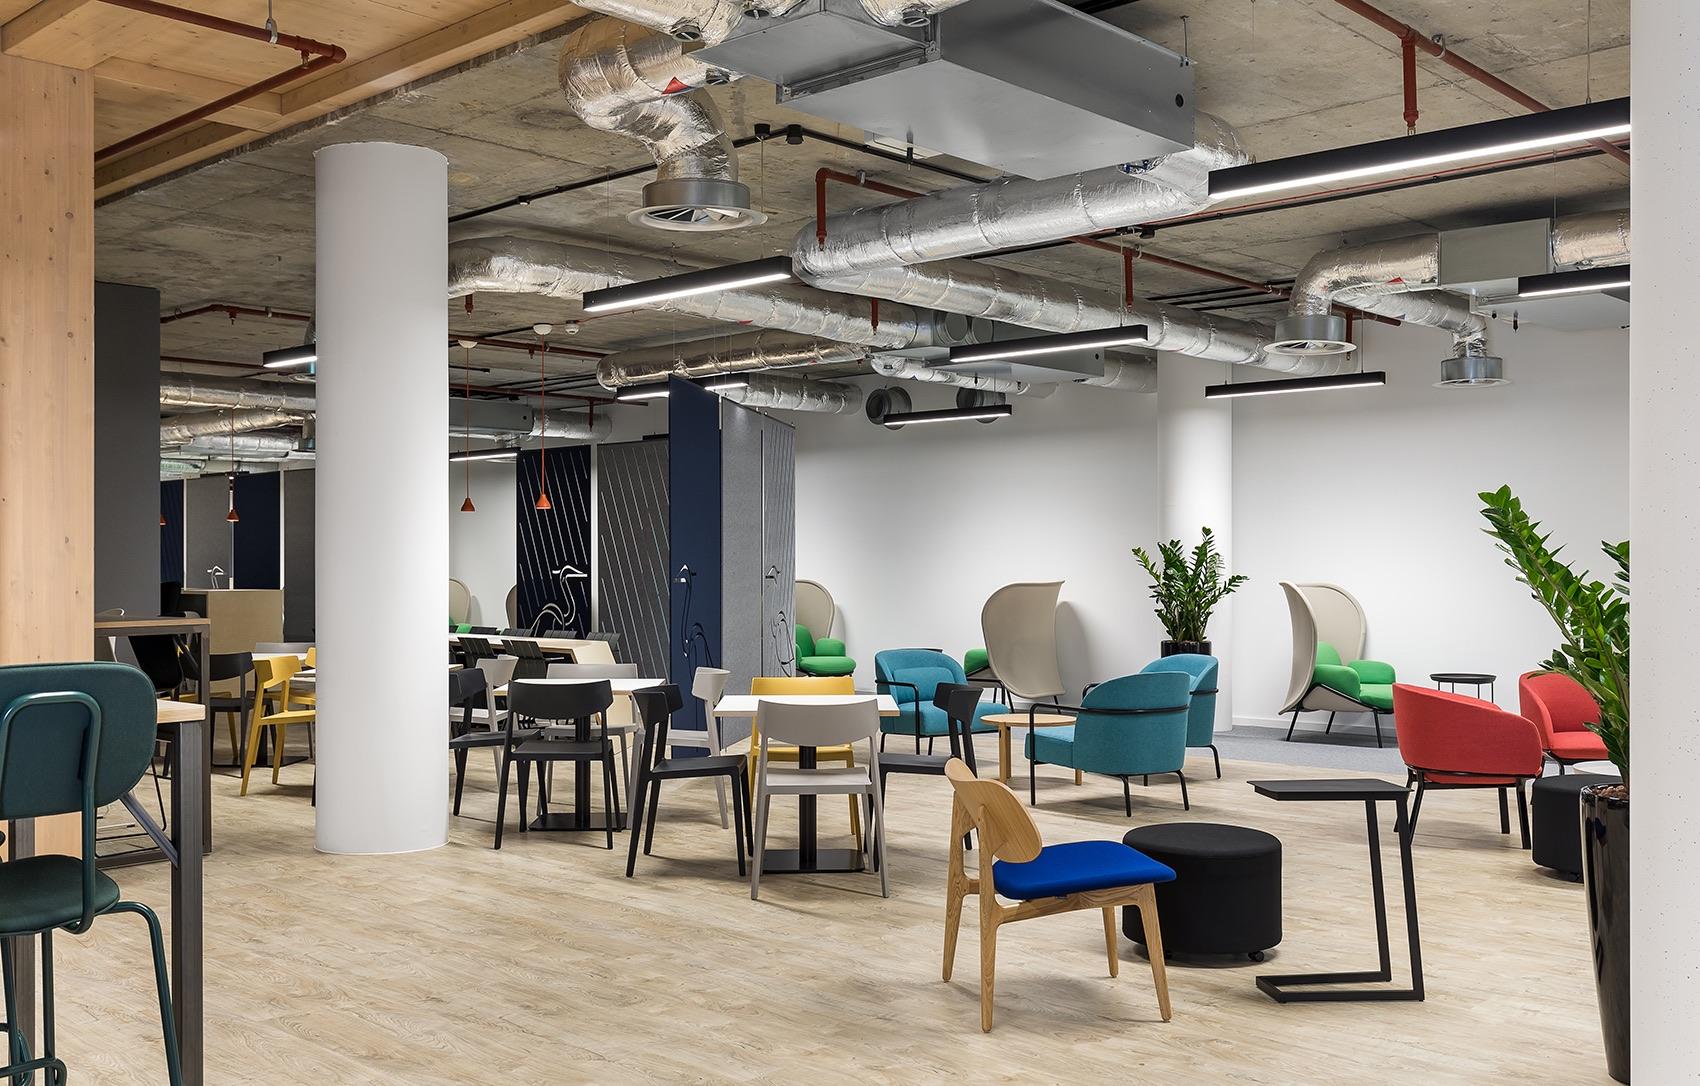 anglia-ruskin-university-office-london-18